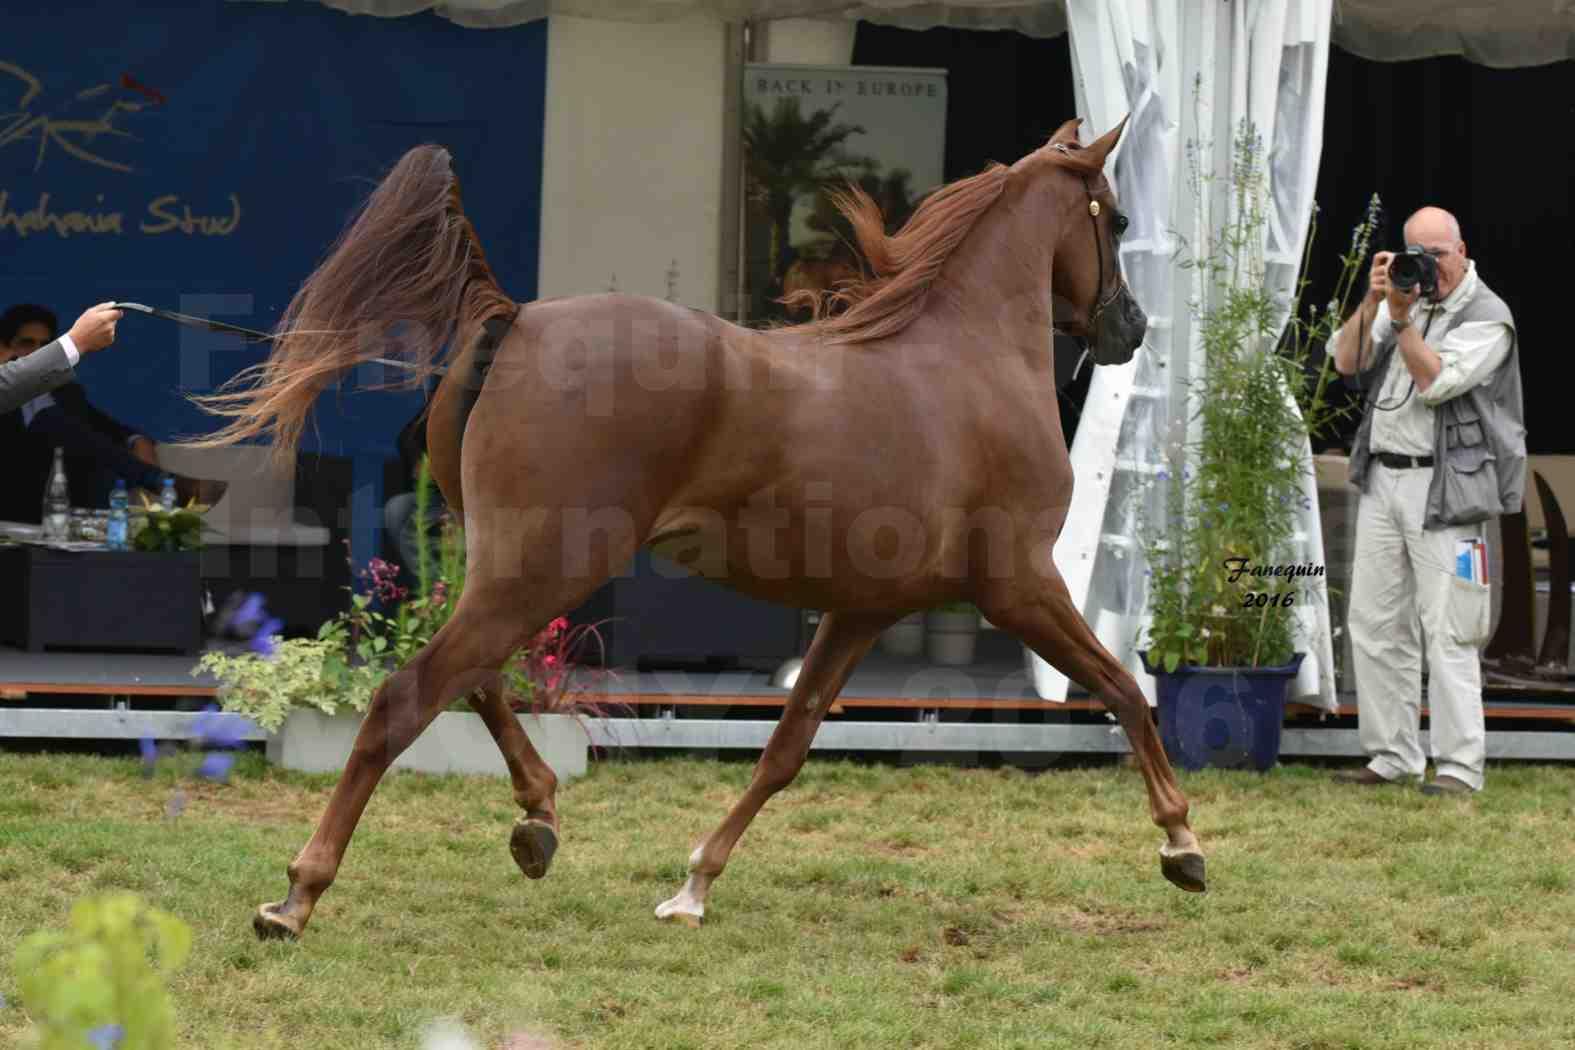 International Arabian Horse Show B de VICHY 2016 - PEARL DE DJOON - Notre Sélection - 22